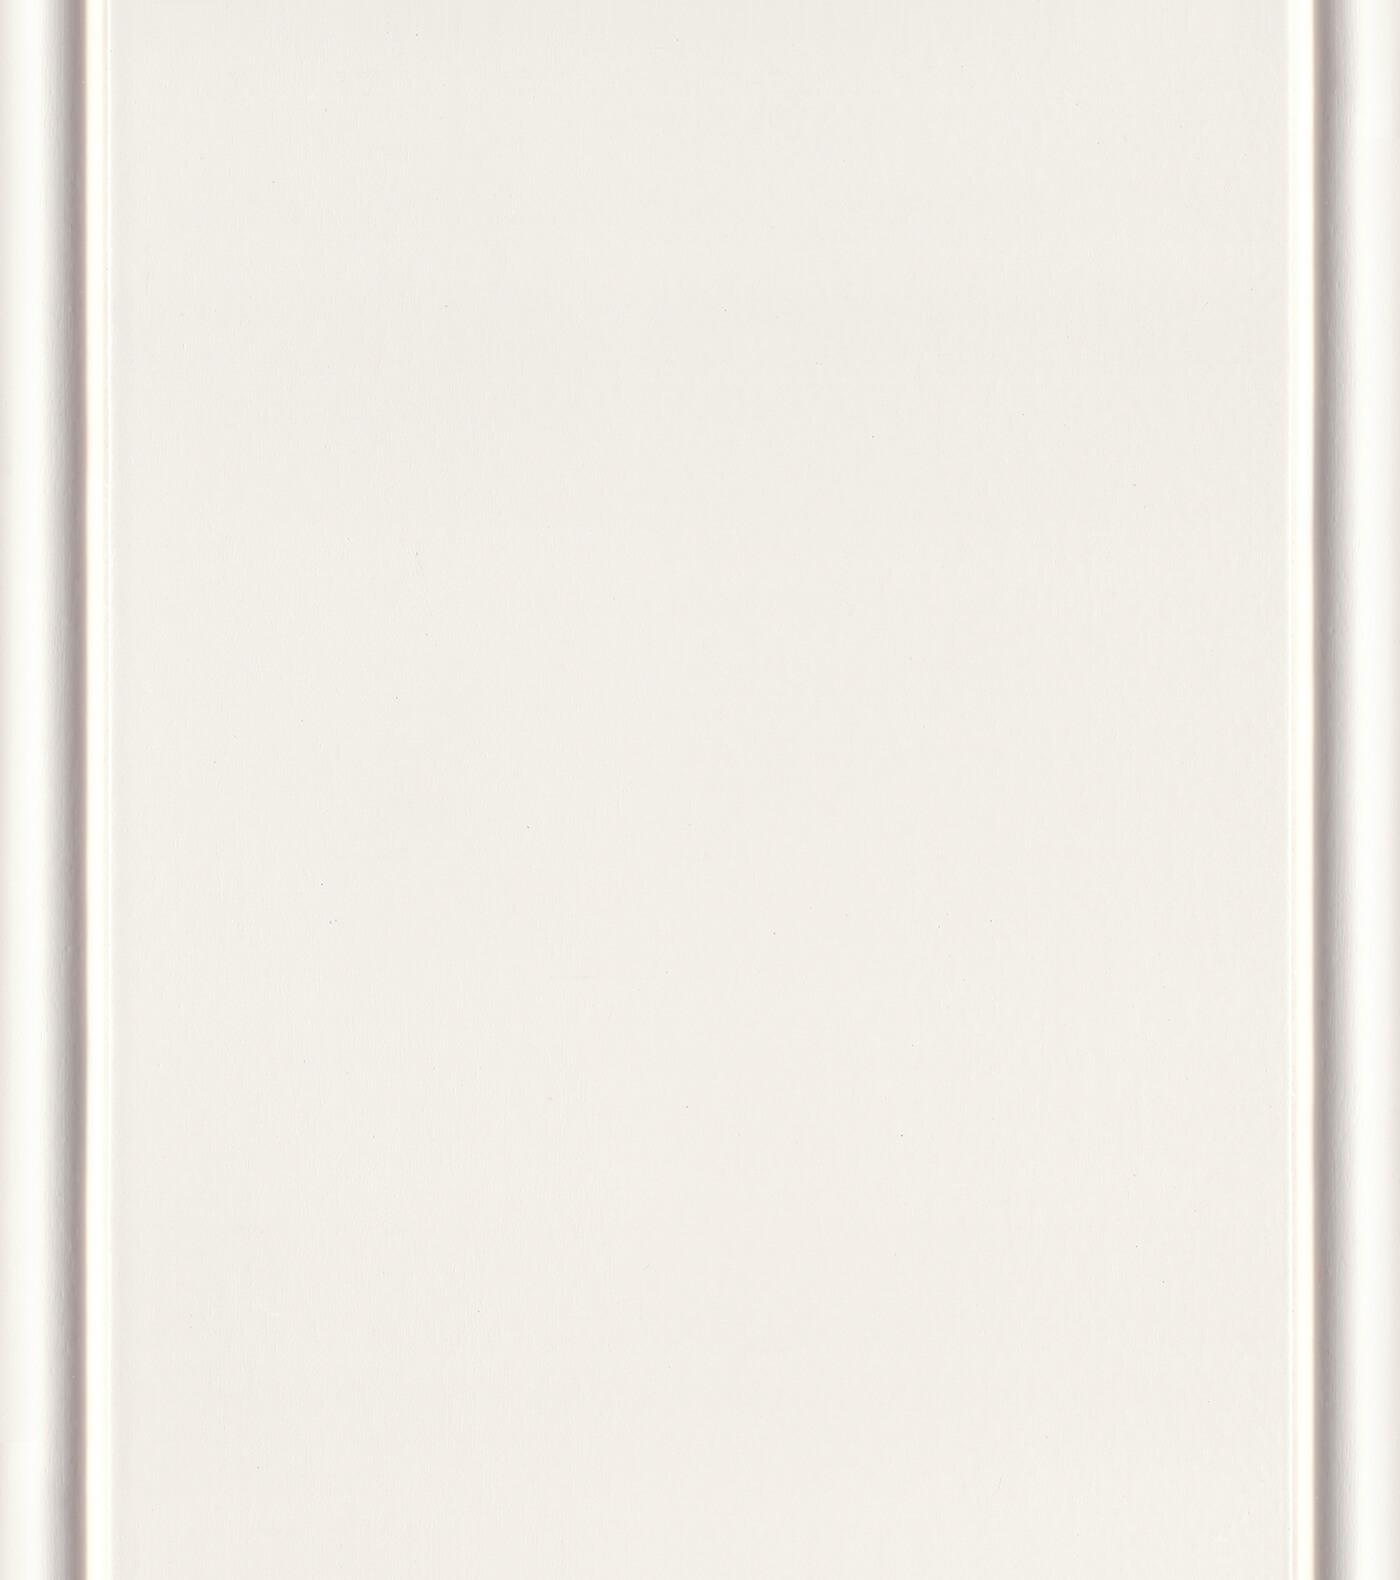 Linen White Paint on Paintable